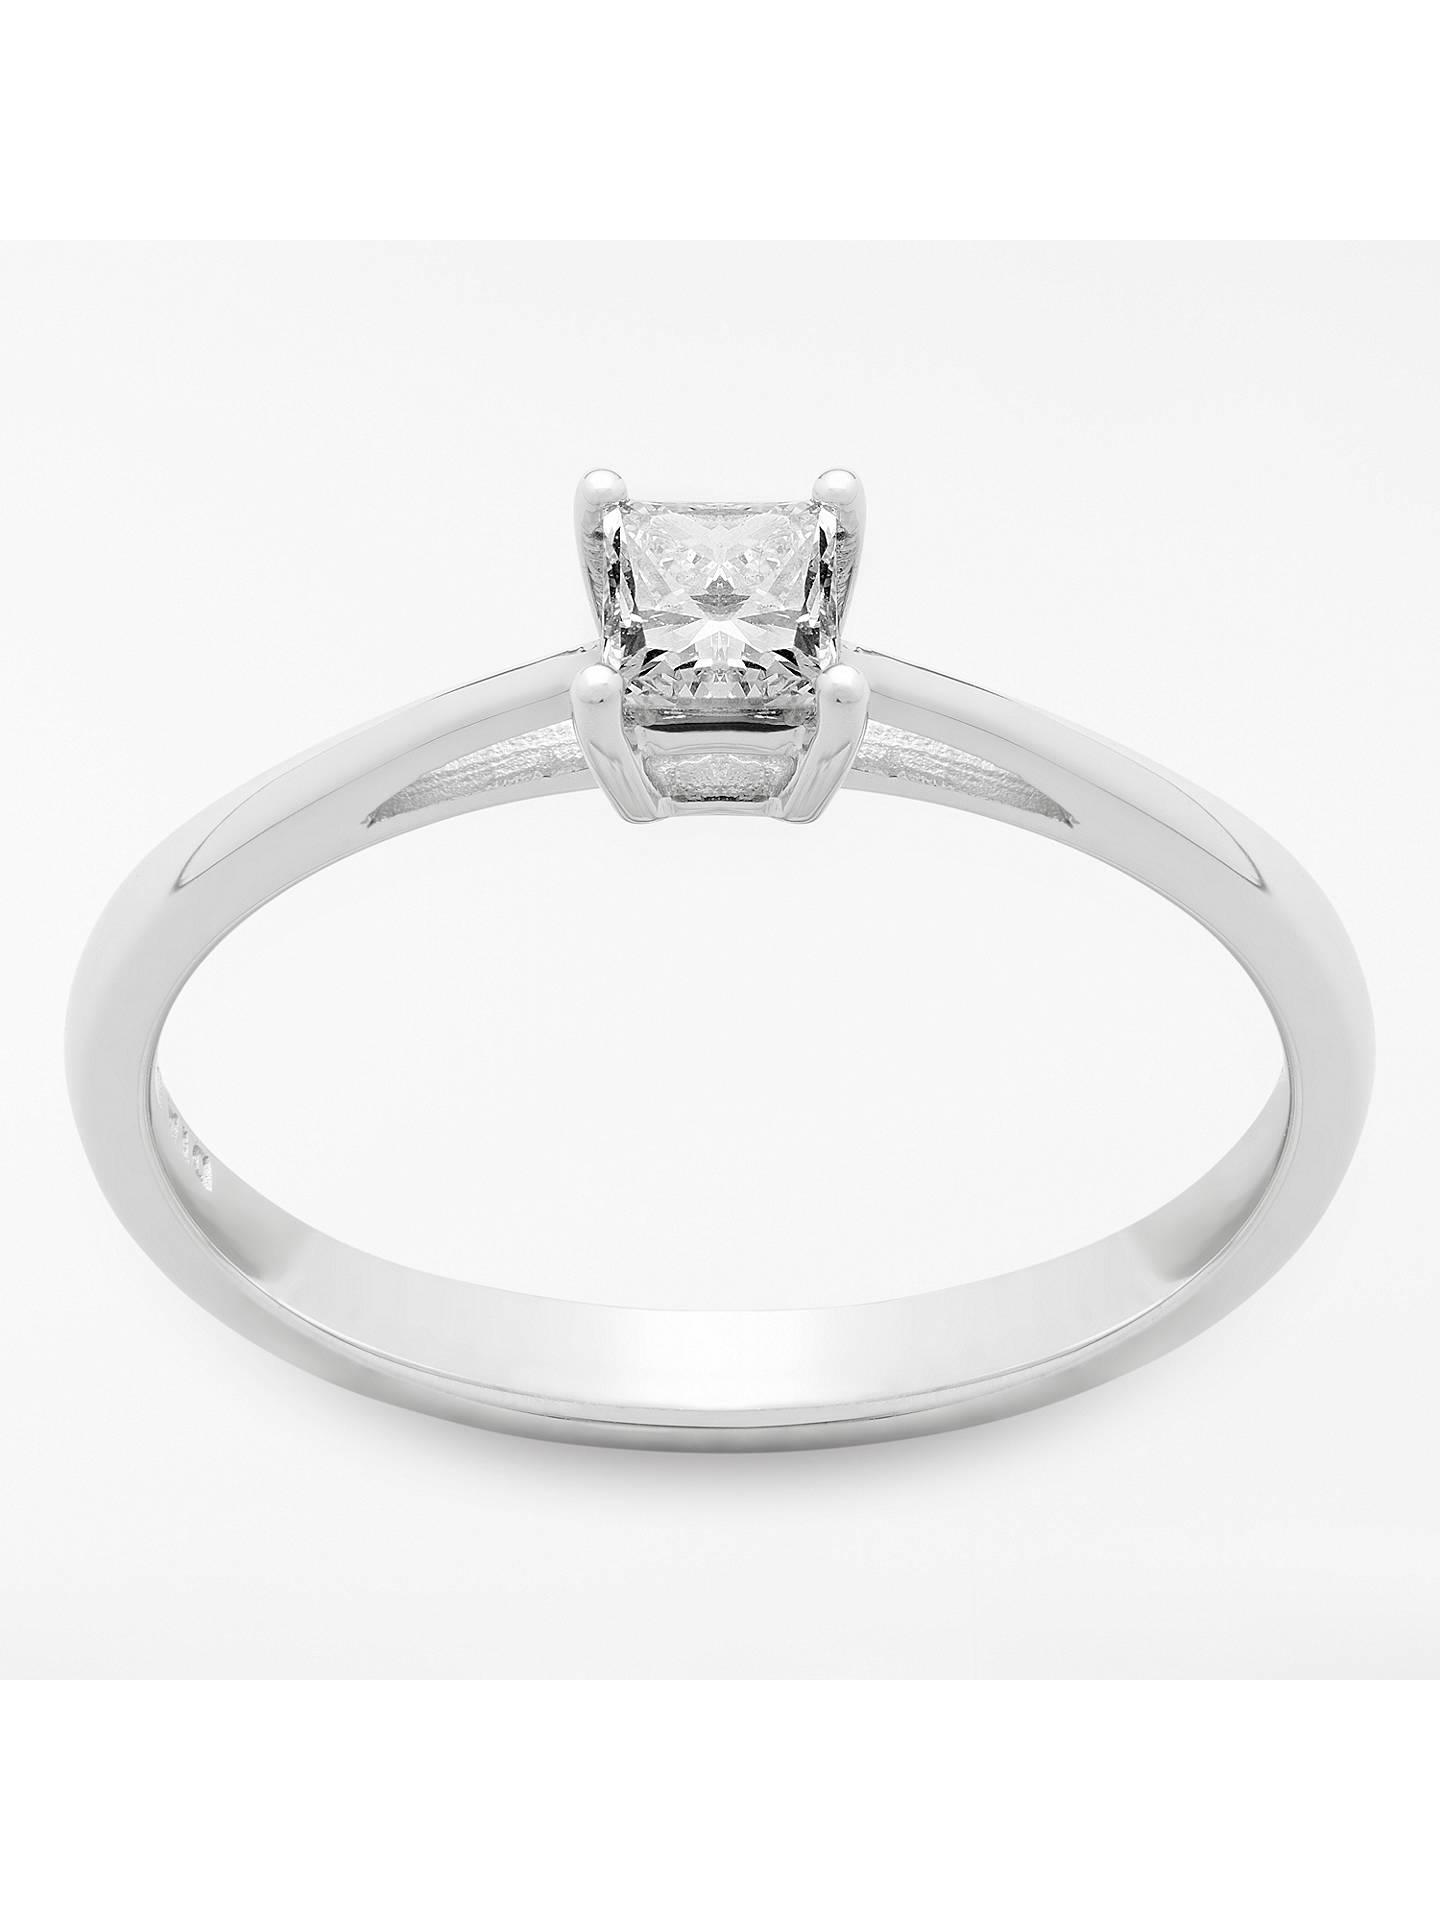 a609ce4efd309 Mogul 18ct White Gold Princess Cut Diamond Engagement Ring, 0.25ct